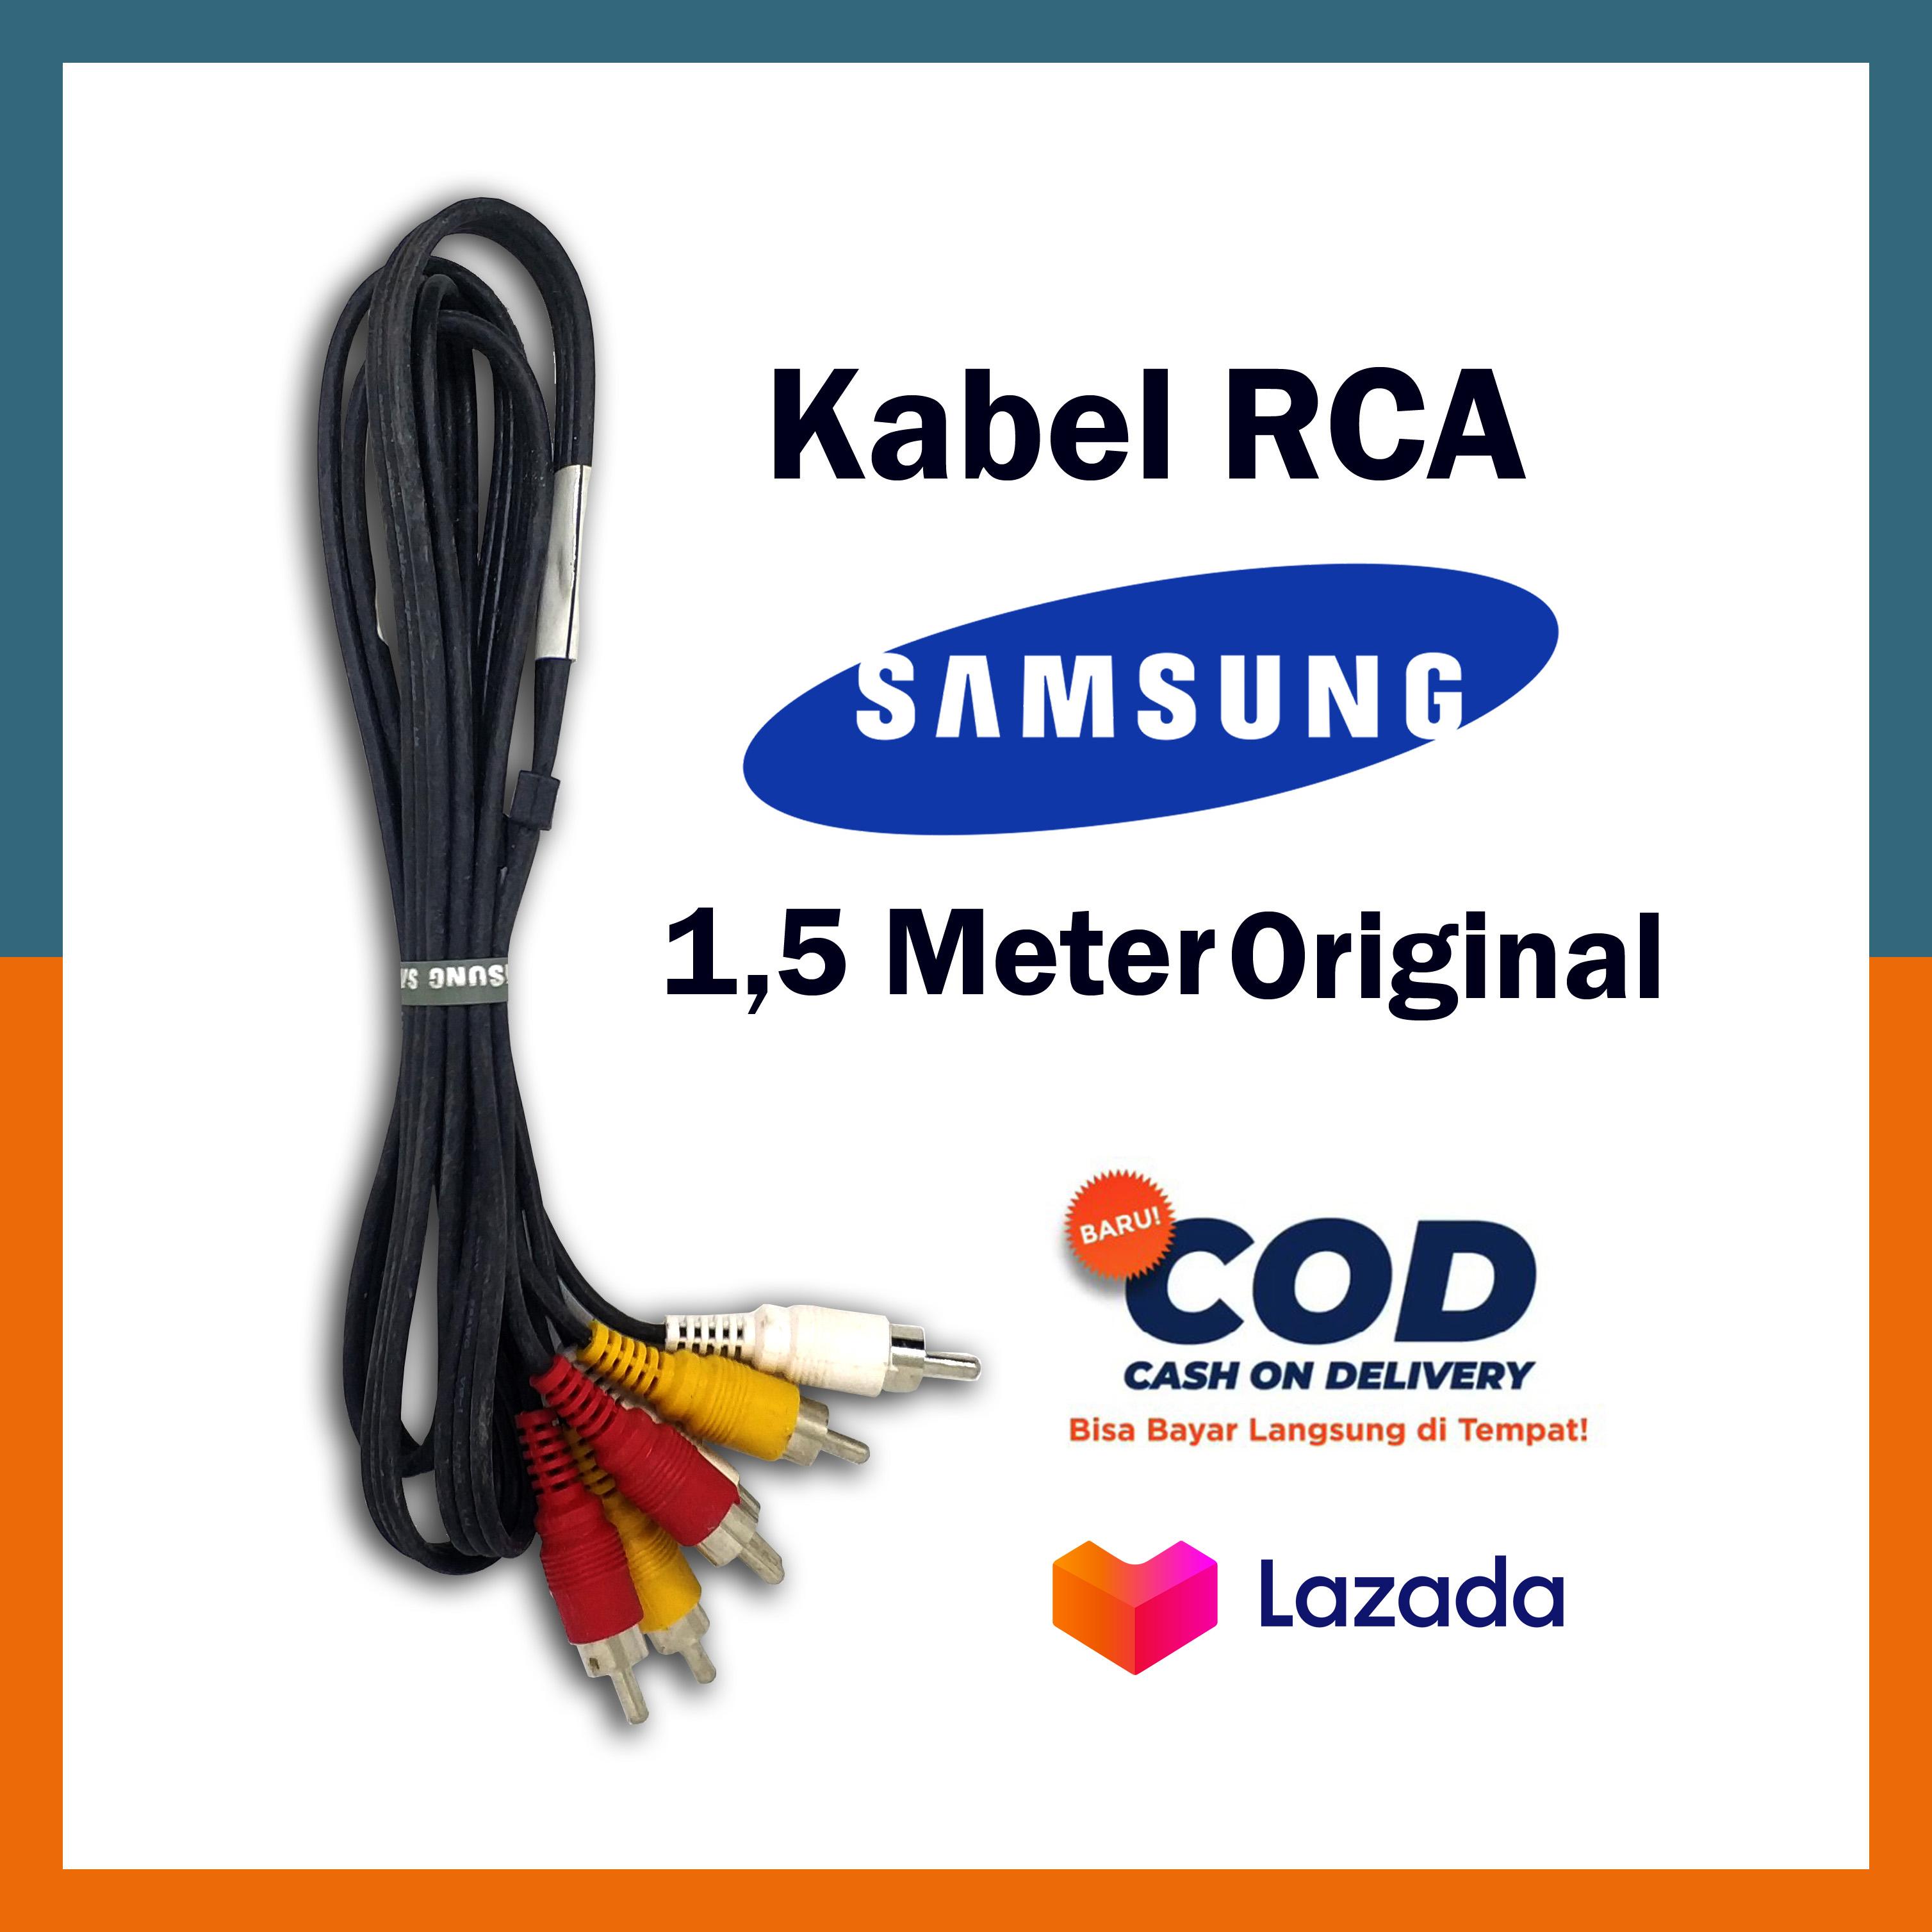 Kabel RCA Samsung Original